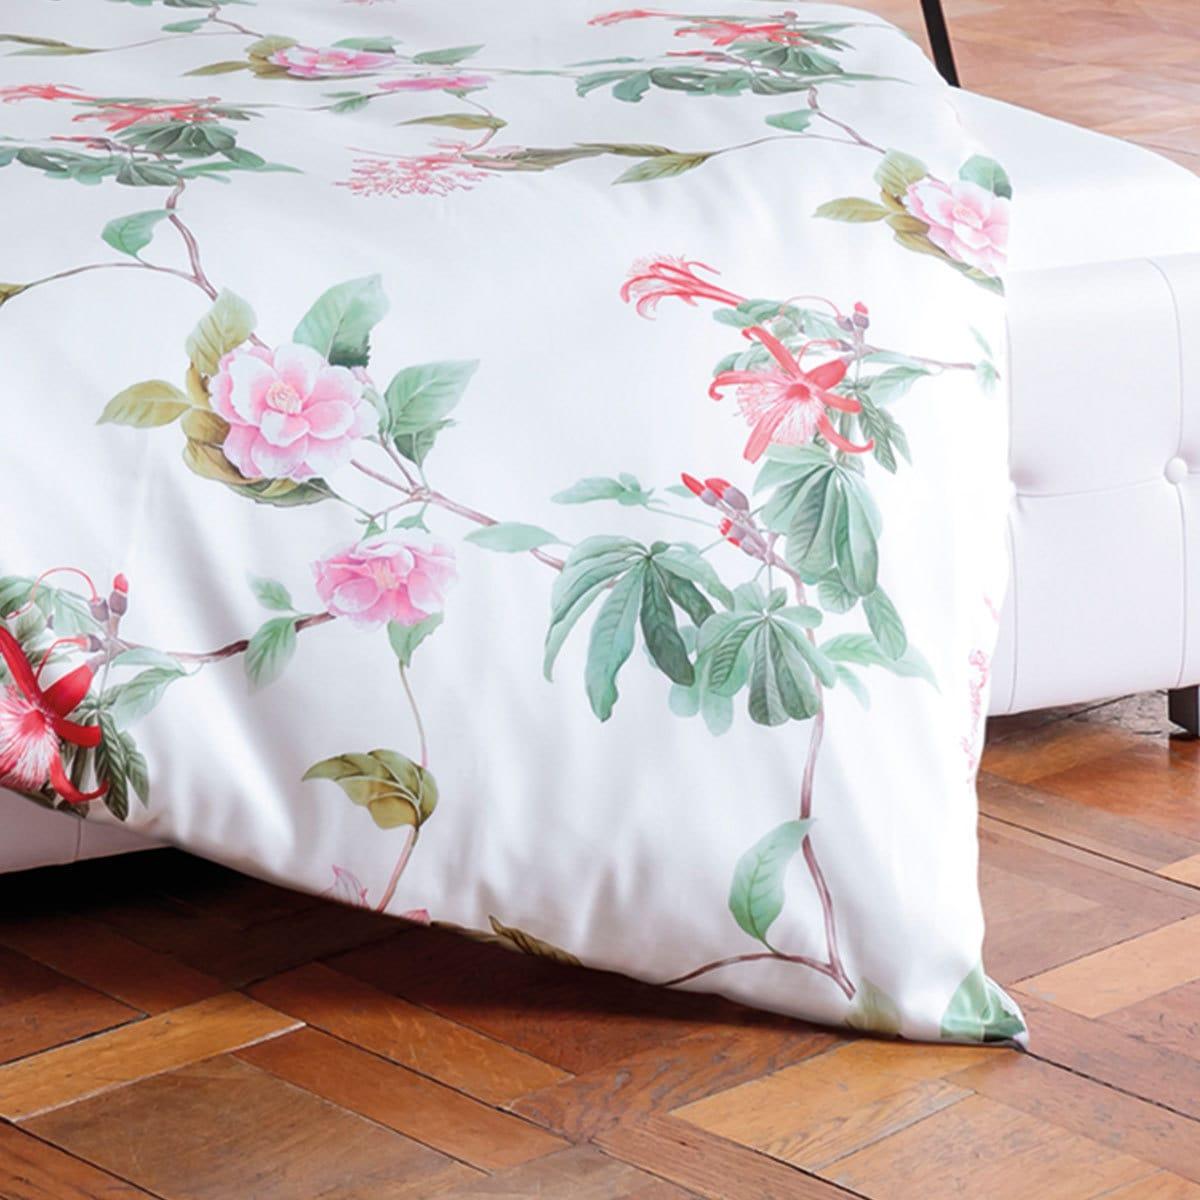 hefel tencel bettw sche pure luxury florence g nstig online kaufen bei bettwaren shop. Black Bedroom Furniture Sets. Home Design Ideas